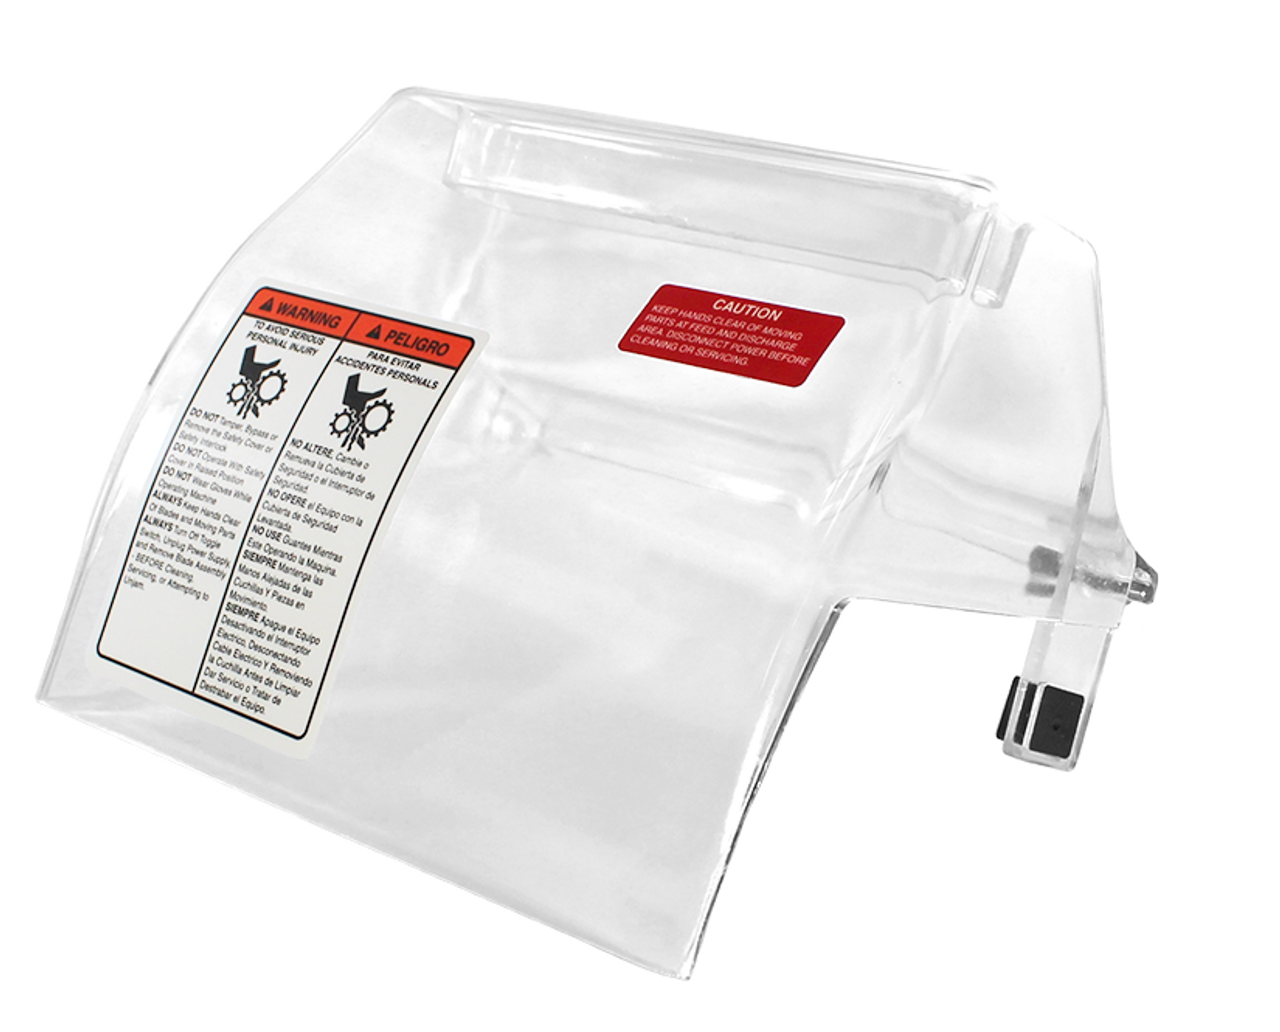 Berkel Safety Cover - BT033